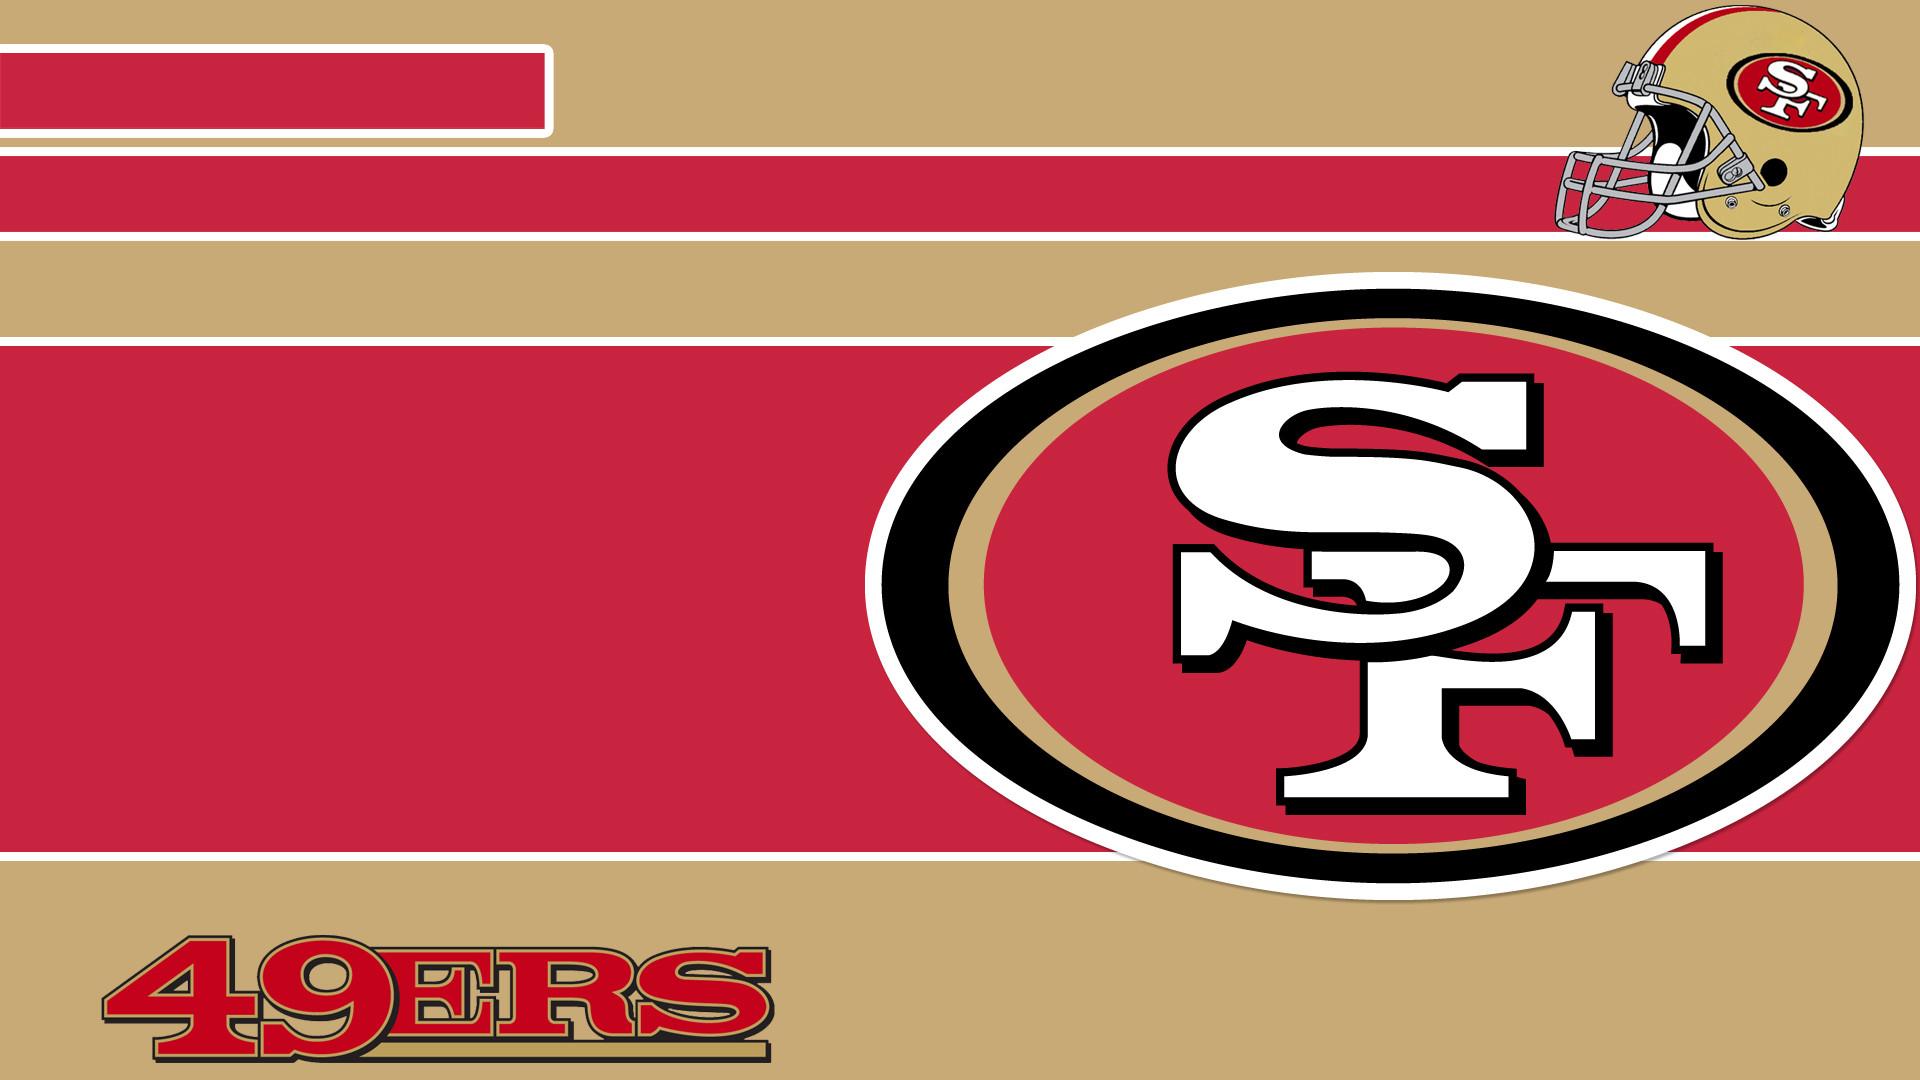 … 49ers wallpaper good gallery image wall compudocs …